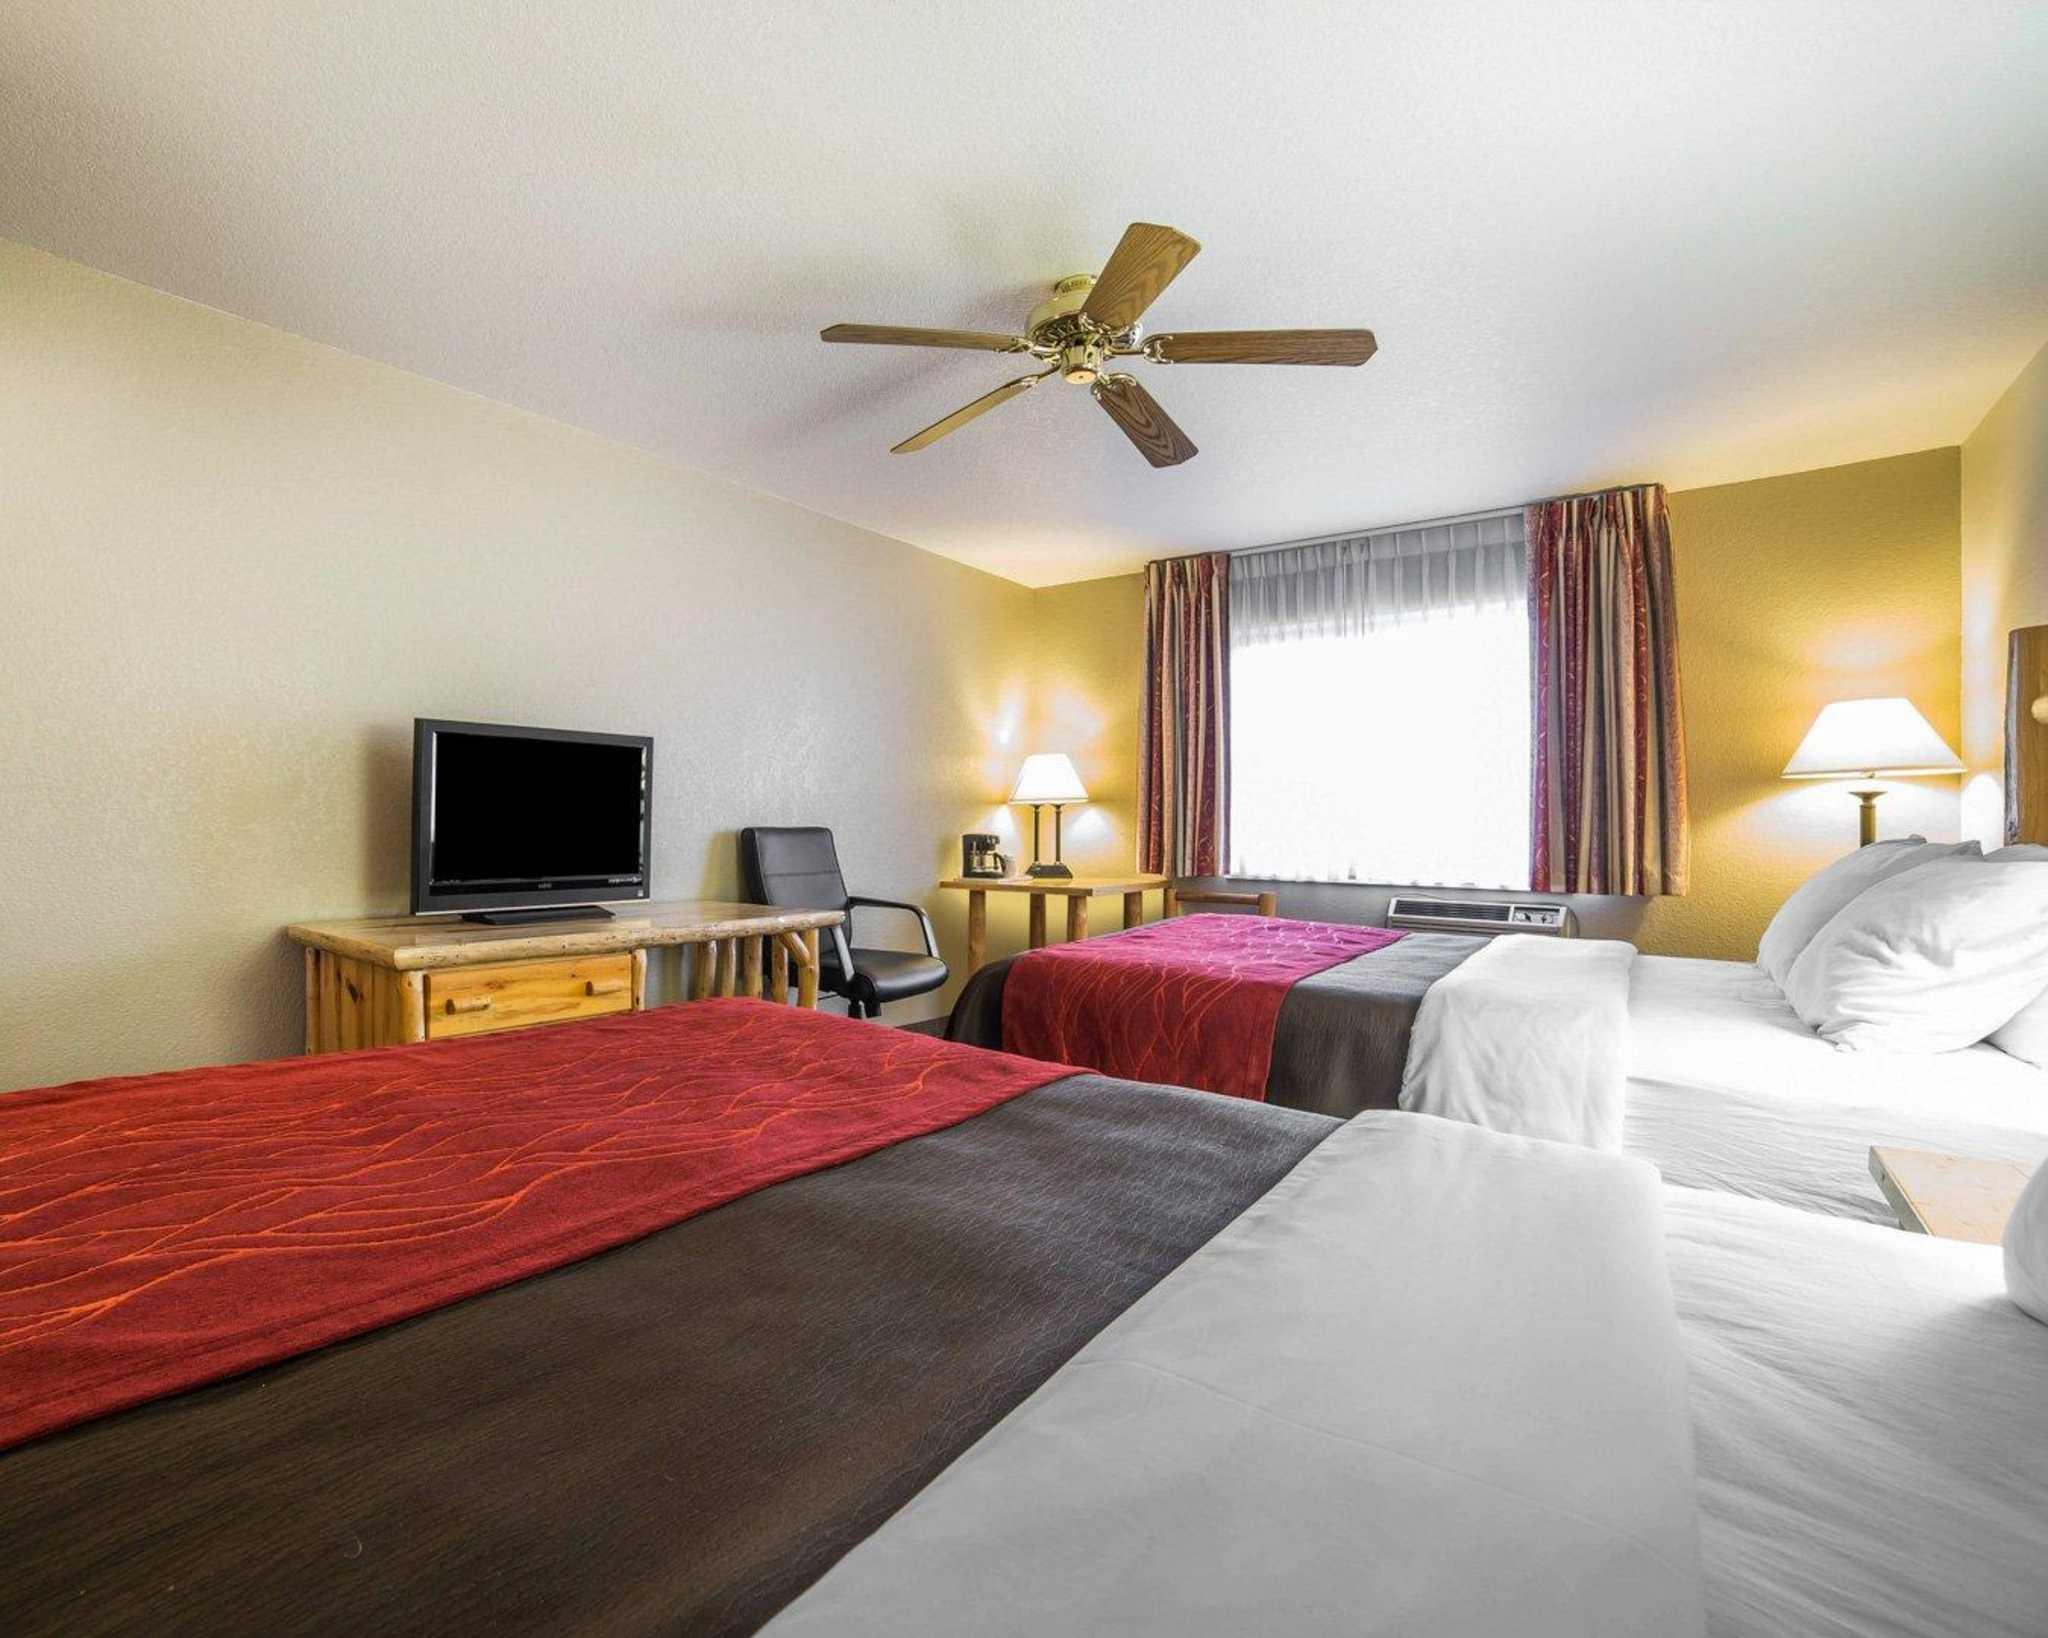 Comfort Inn Yellowstone North image 3